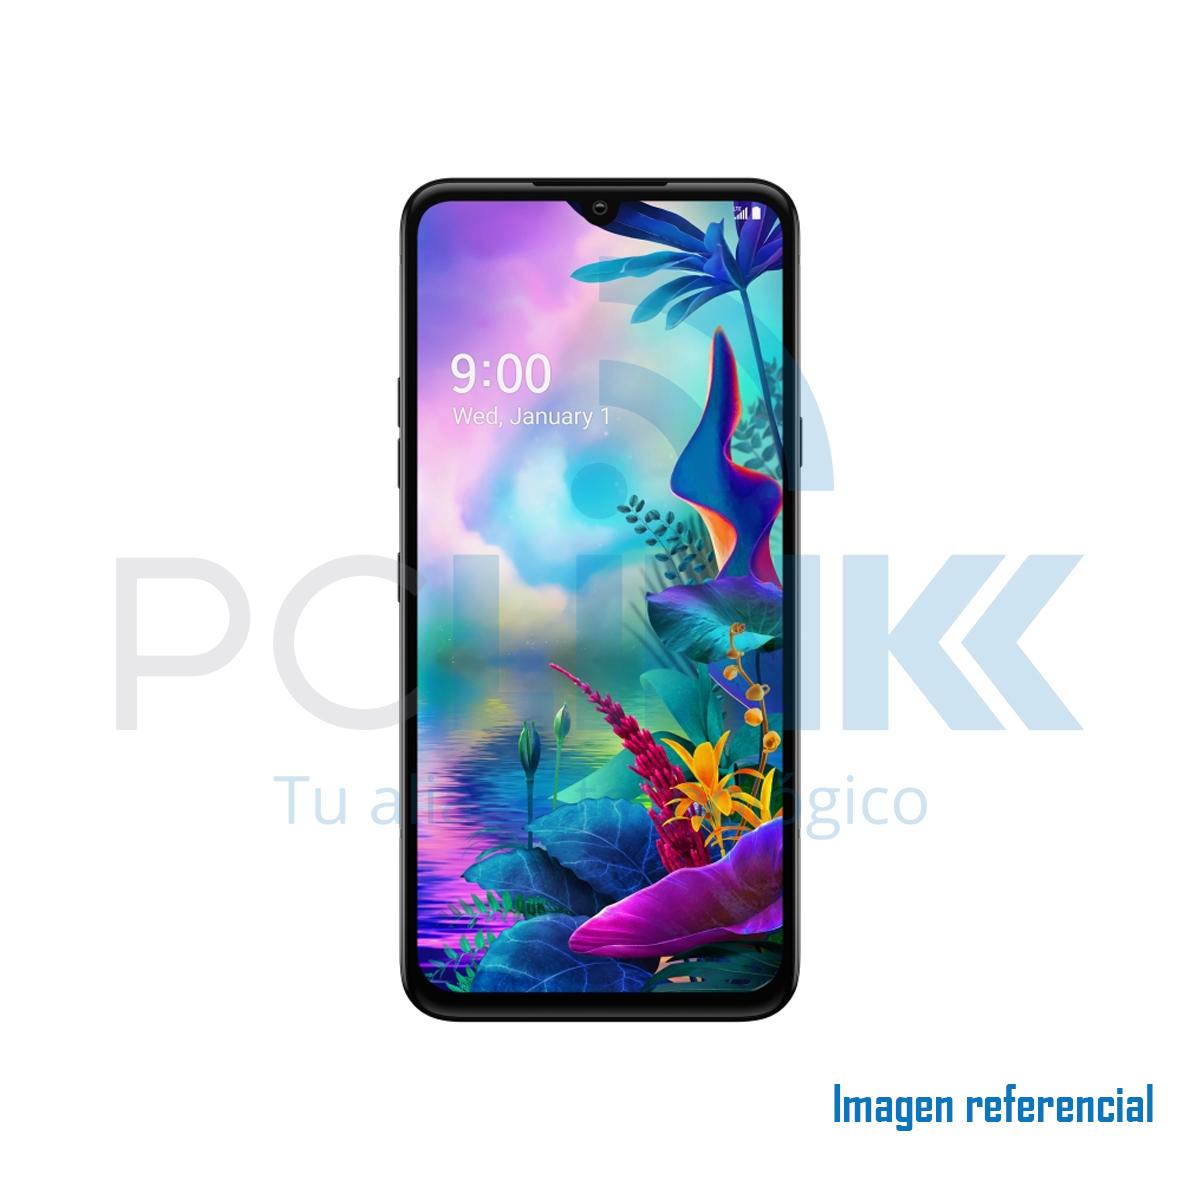 TELÉFONO Smartphone LG G8x Thi